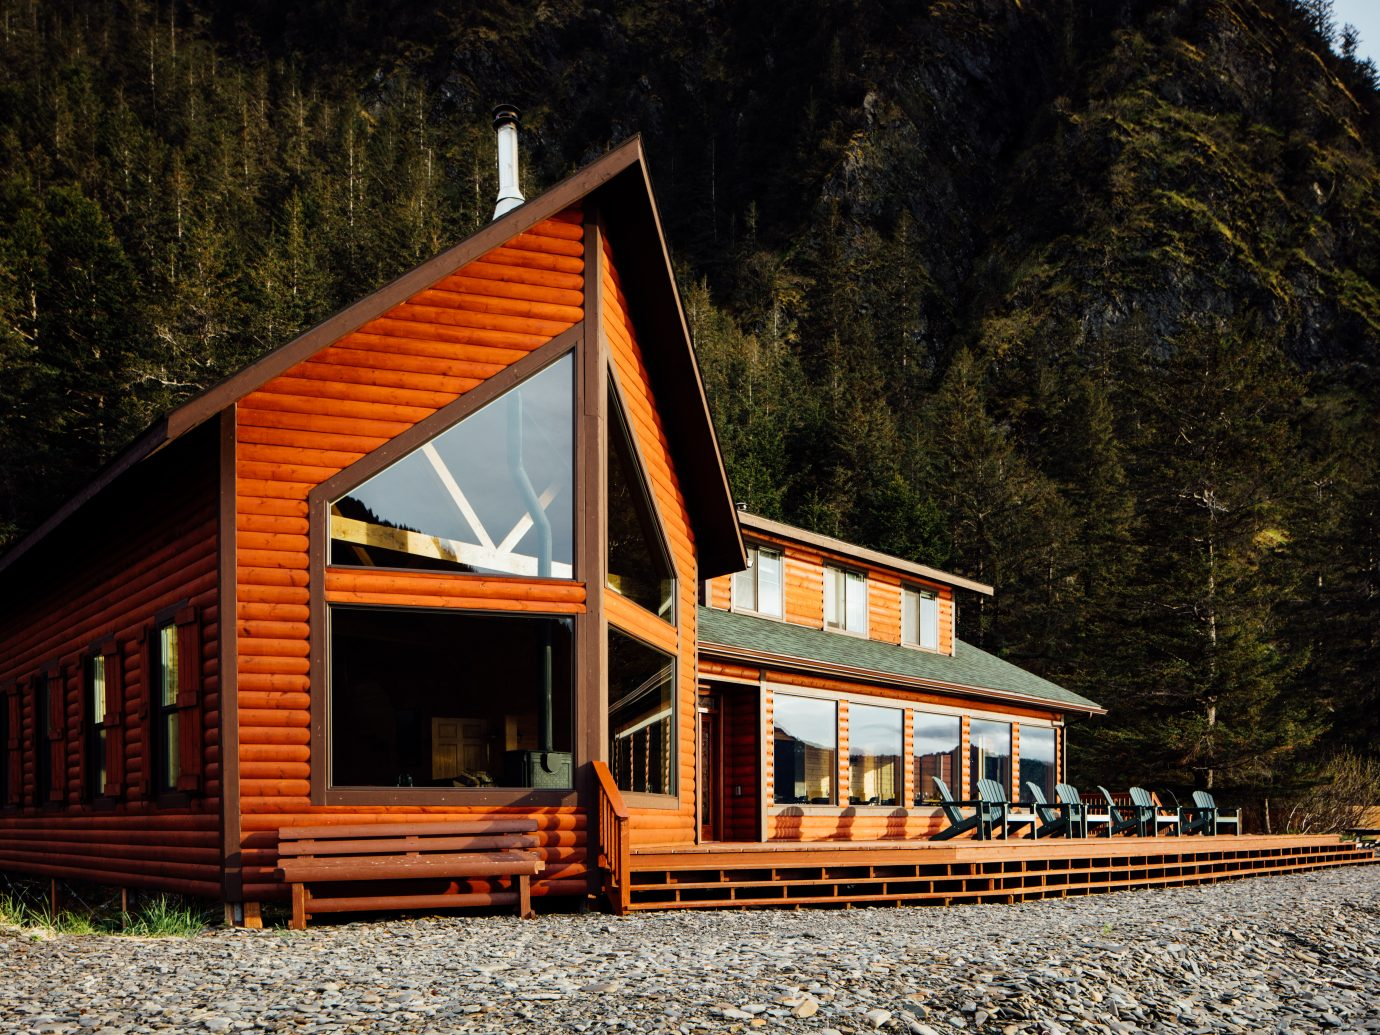 Guest Lodge at Kenai Fjords Wilderness Lodge, Alaska